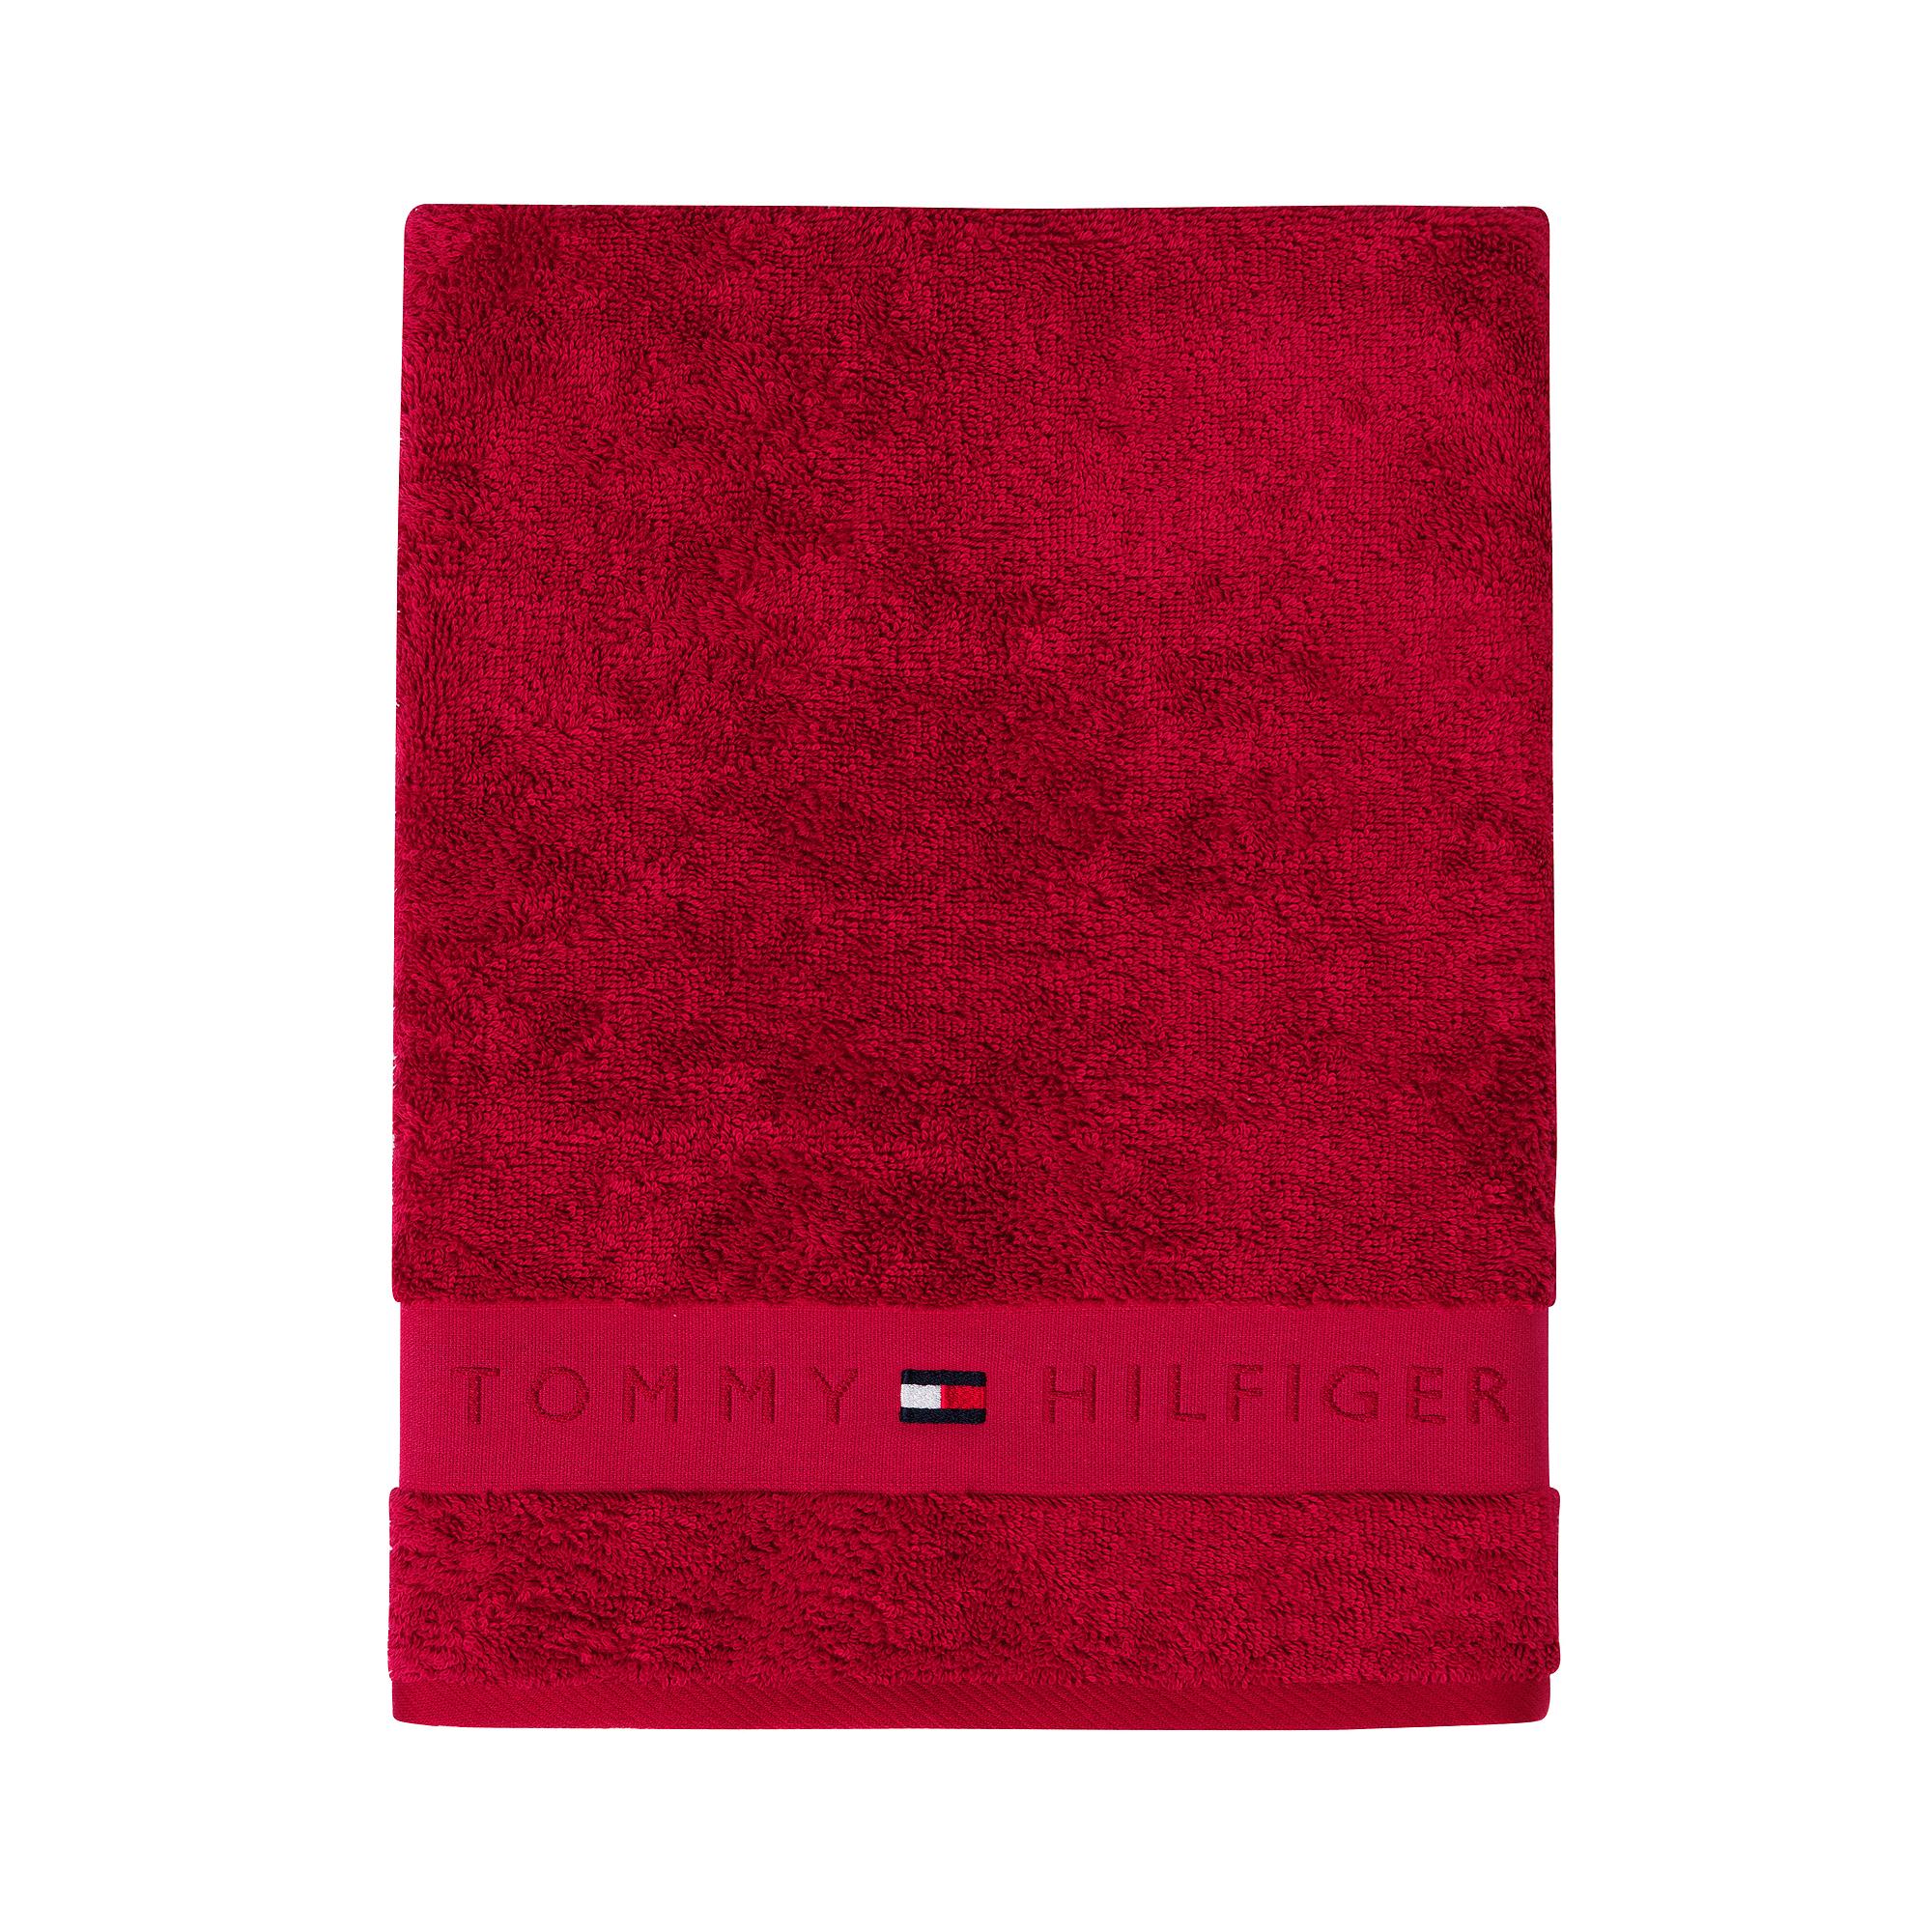 LEGEND 2 SERVIETTE TOILETTE RED – Αντιγραφή